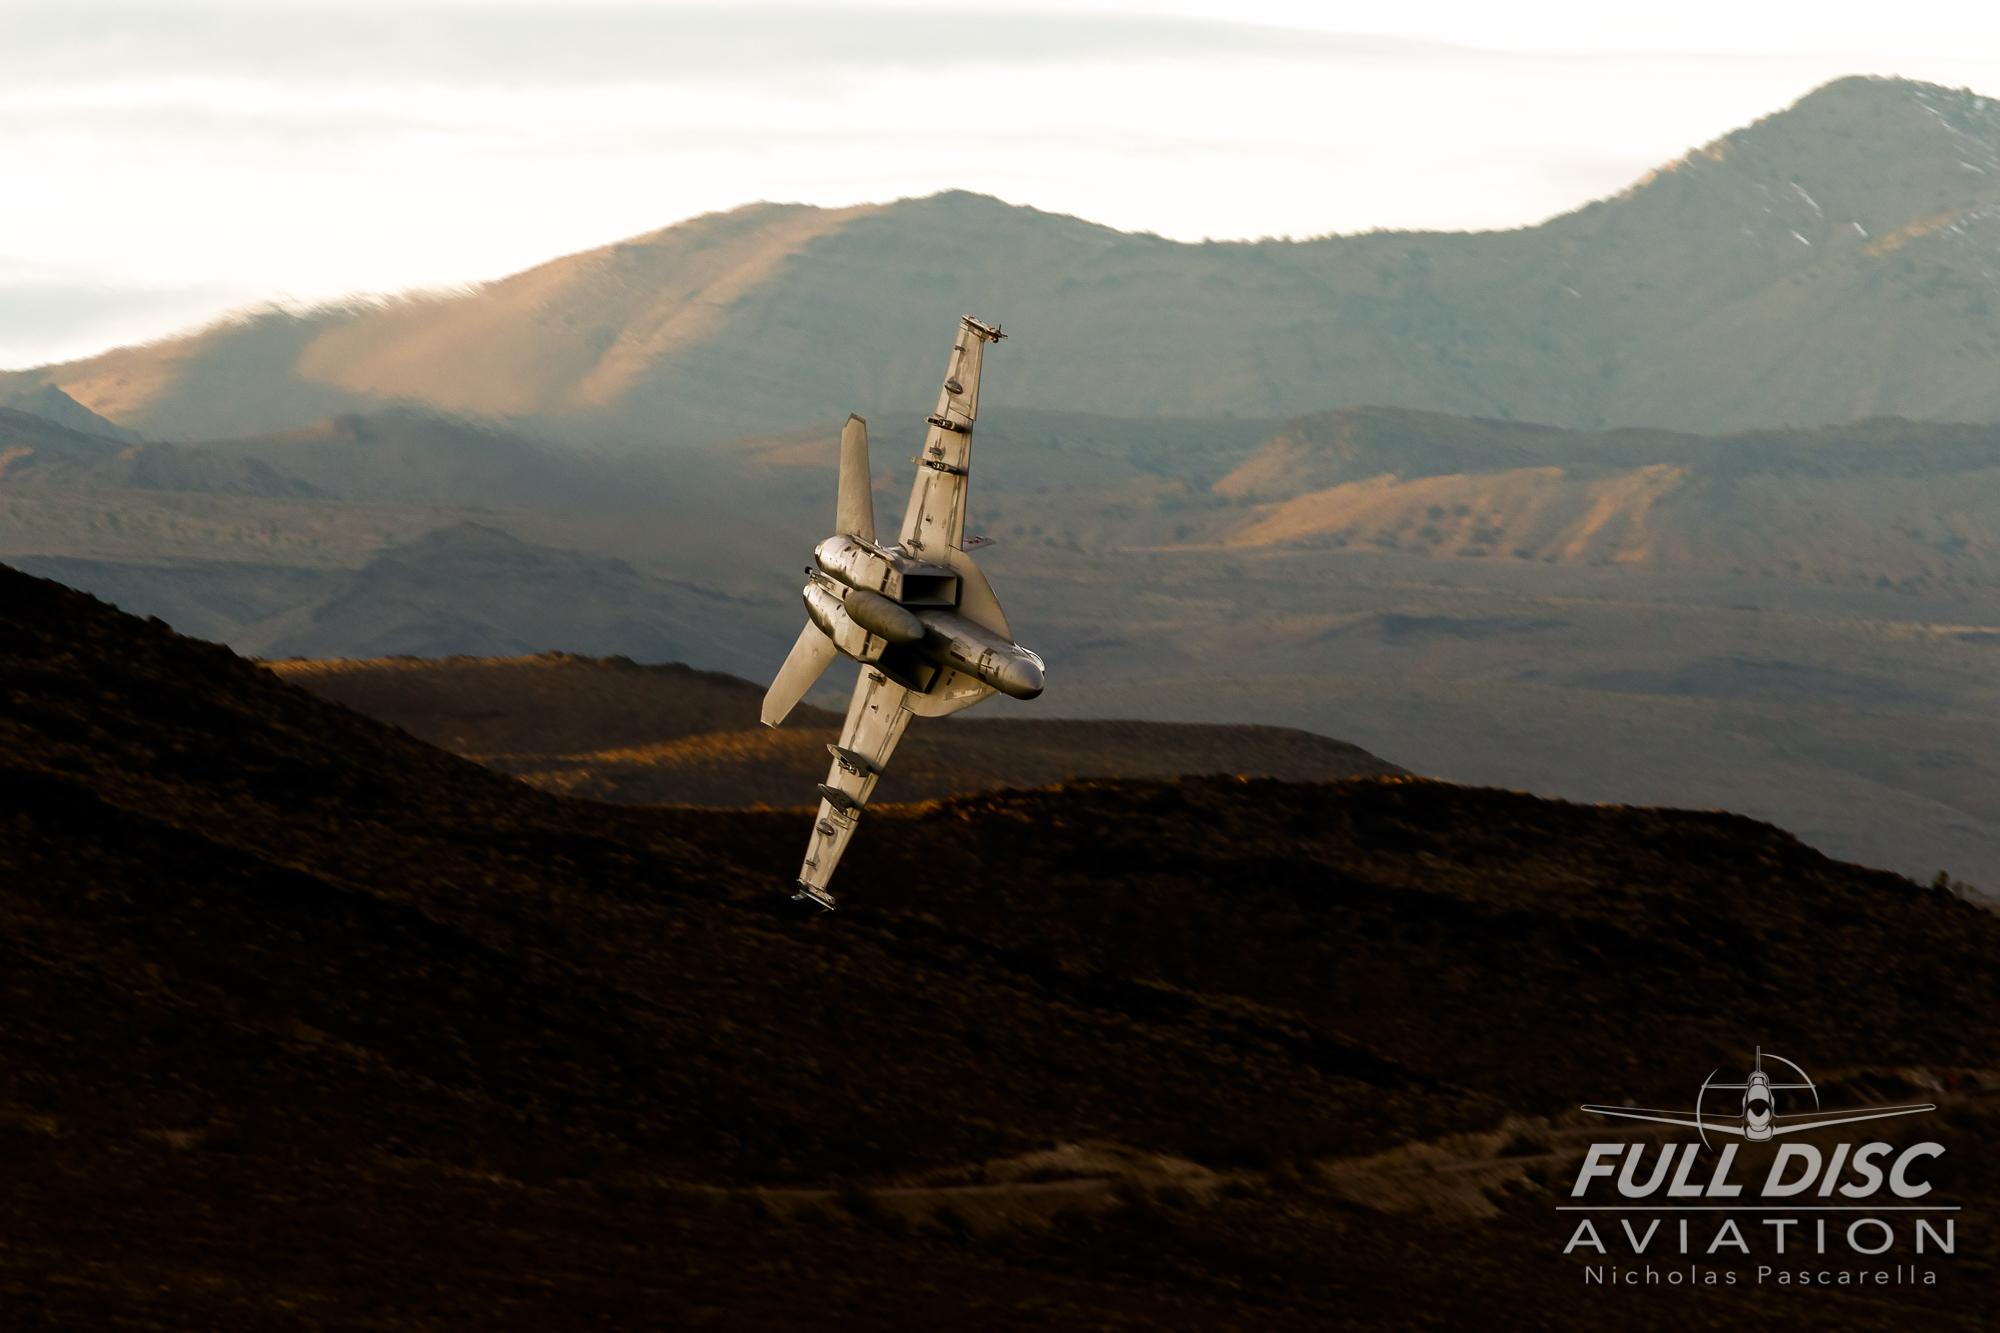 nickpascarella_nicholaspascarella_fulldiscaviation_aircraft_f18_superhornet_jeditransition_starwarscanyon_rainbowcanyon.jpg